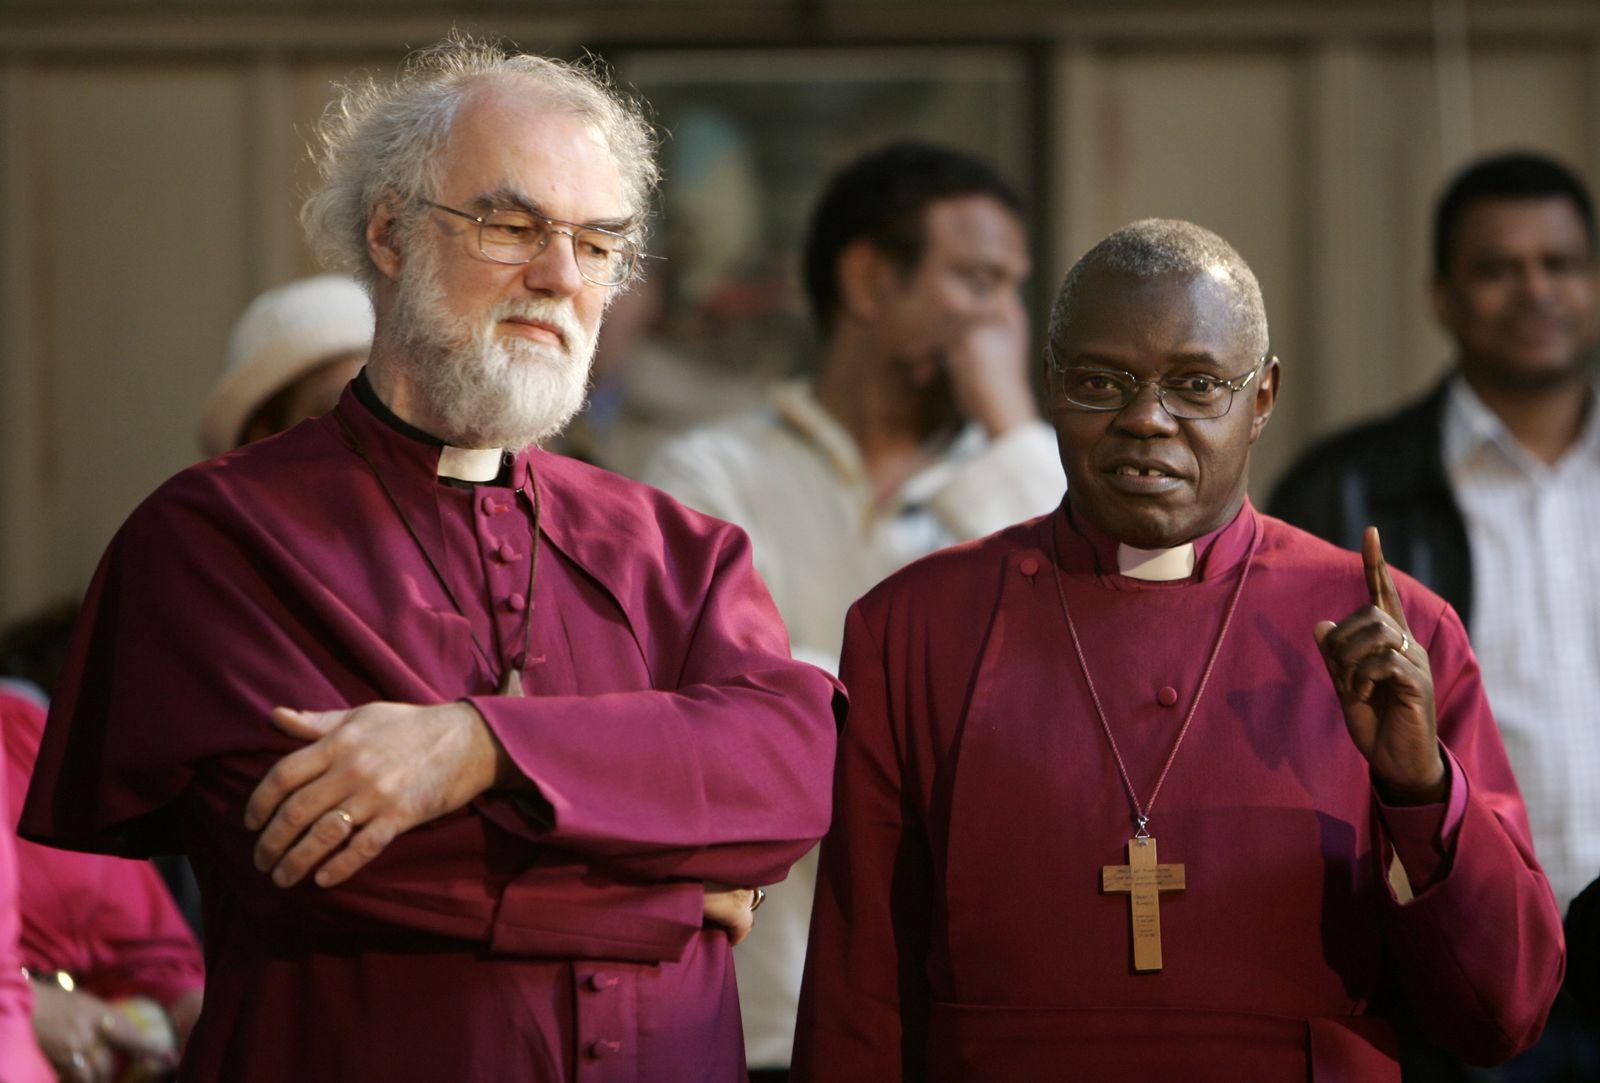 Anglikanische Kirche / Rowan Williams / John Sentamu